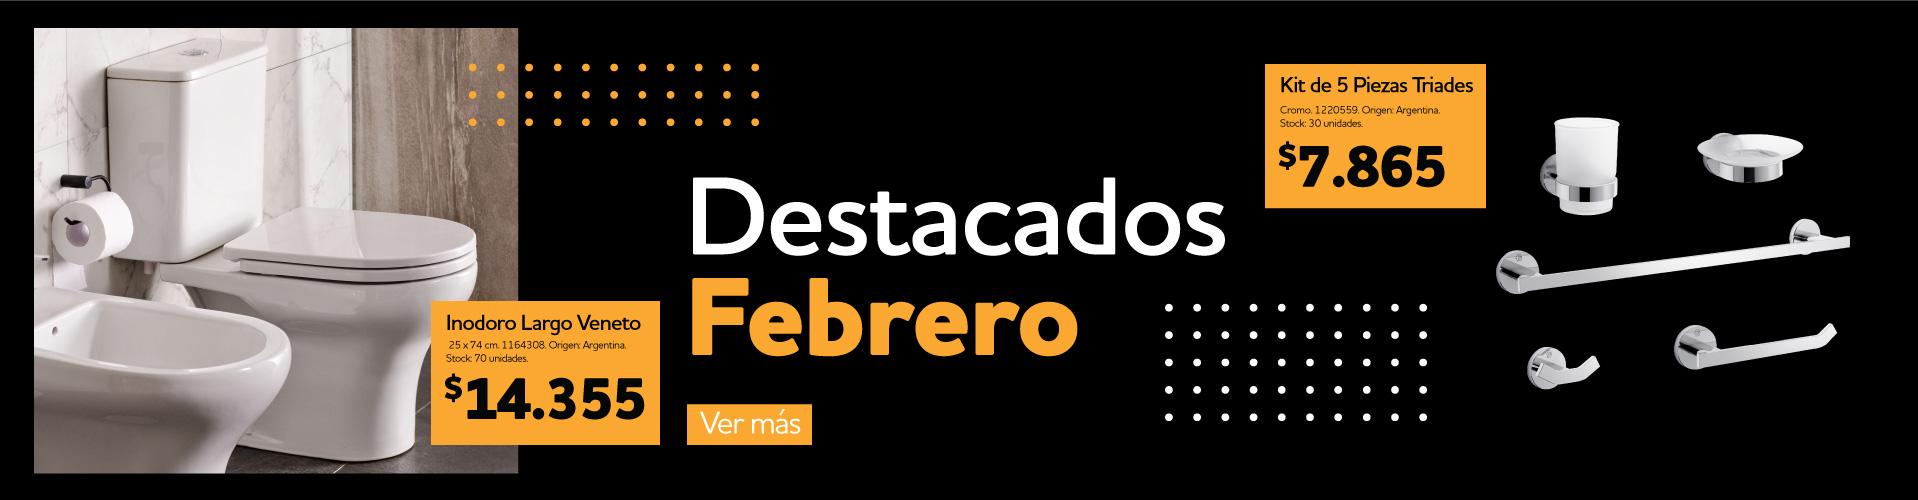 DESTACADOS FEBRERO